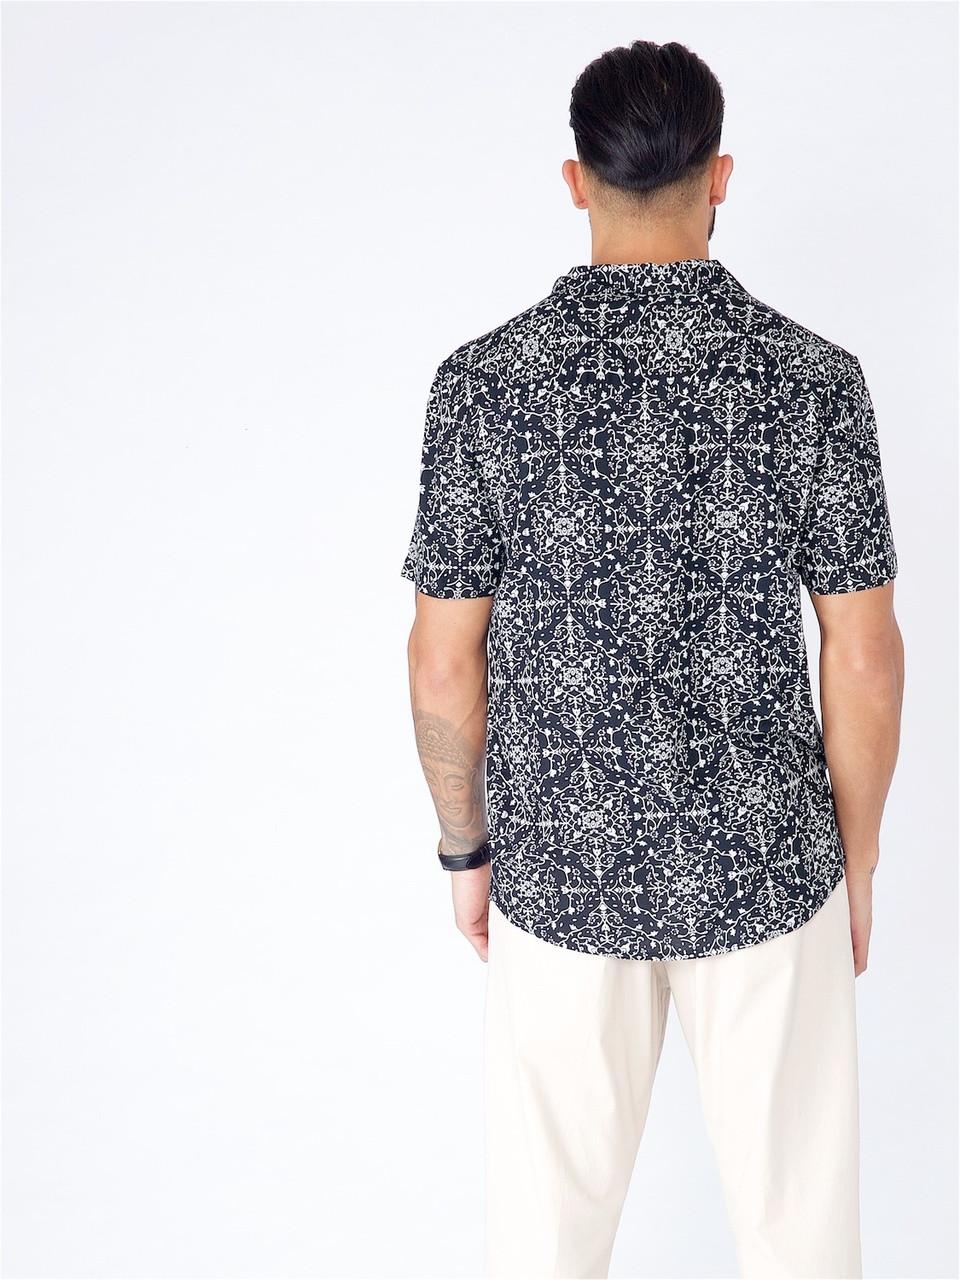 Black Printed Short Sleeve Shirt